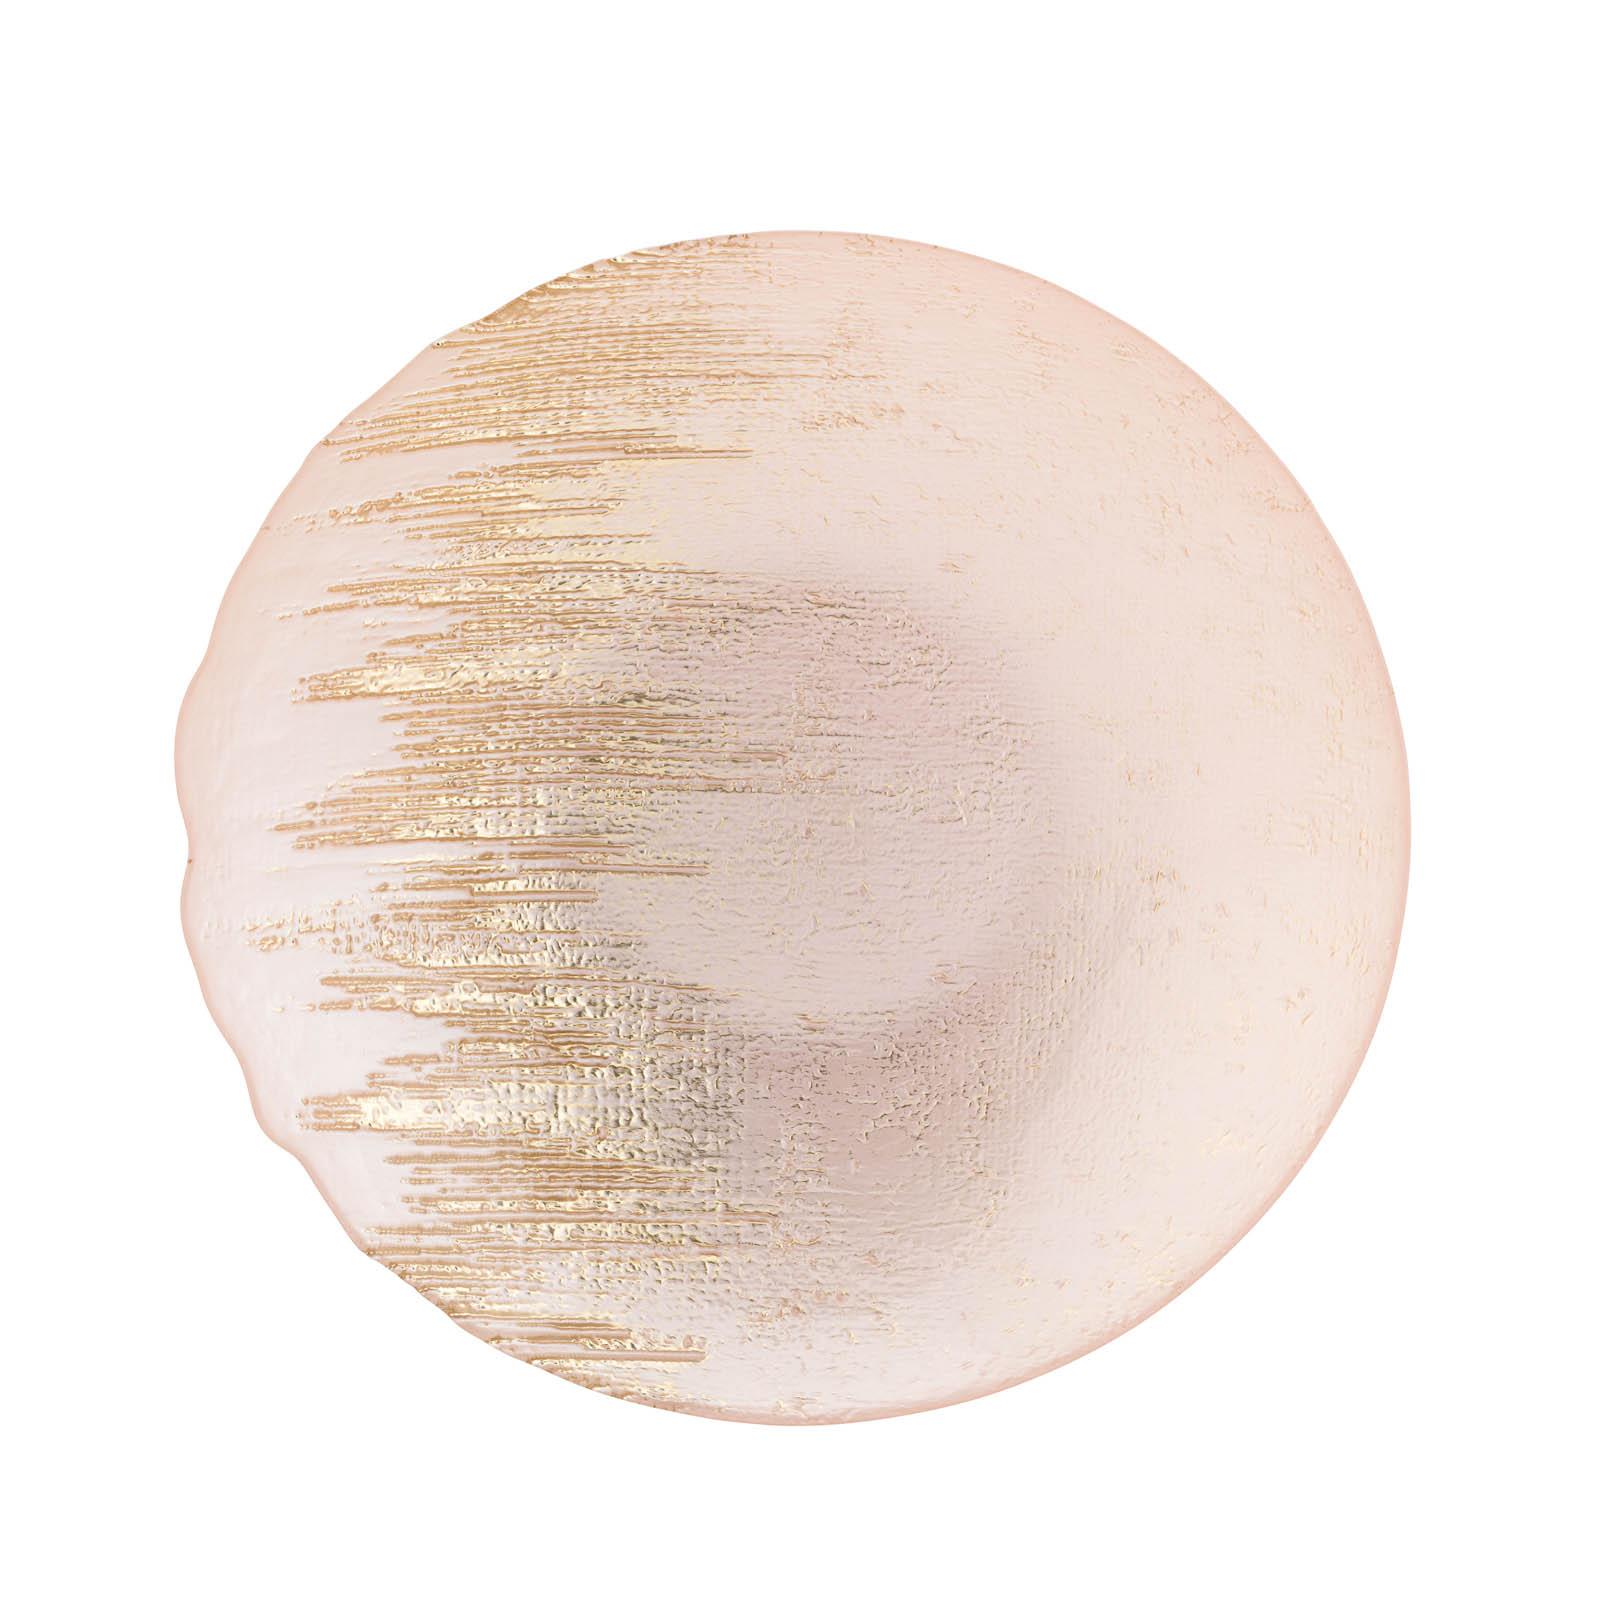 Seraphina Gold Brush Serving Bowl, 13 inch Diameter